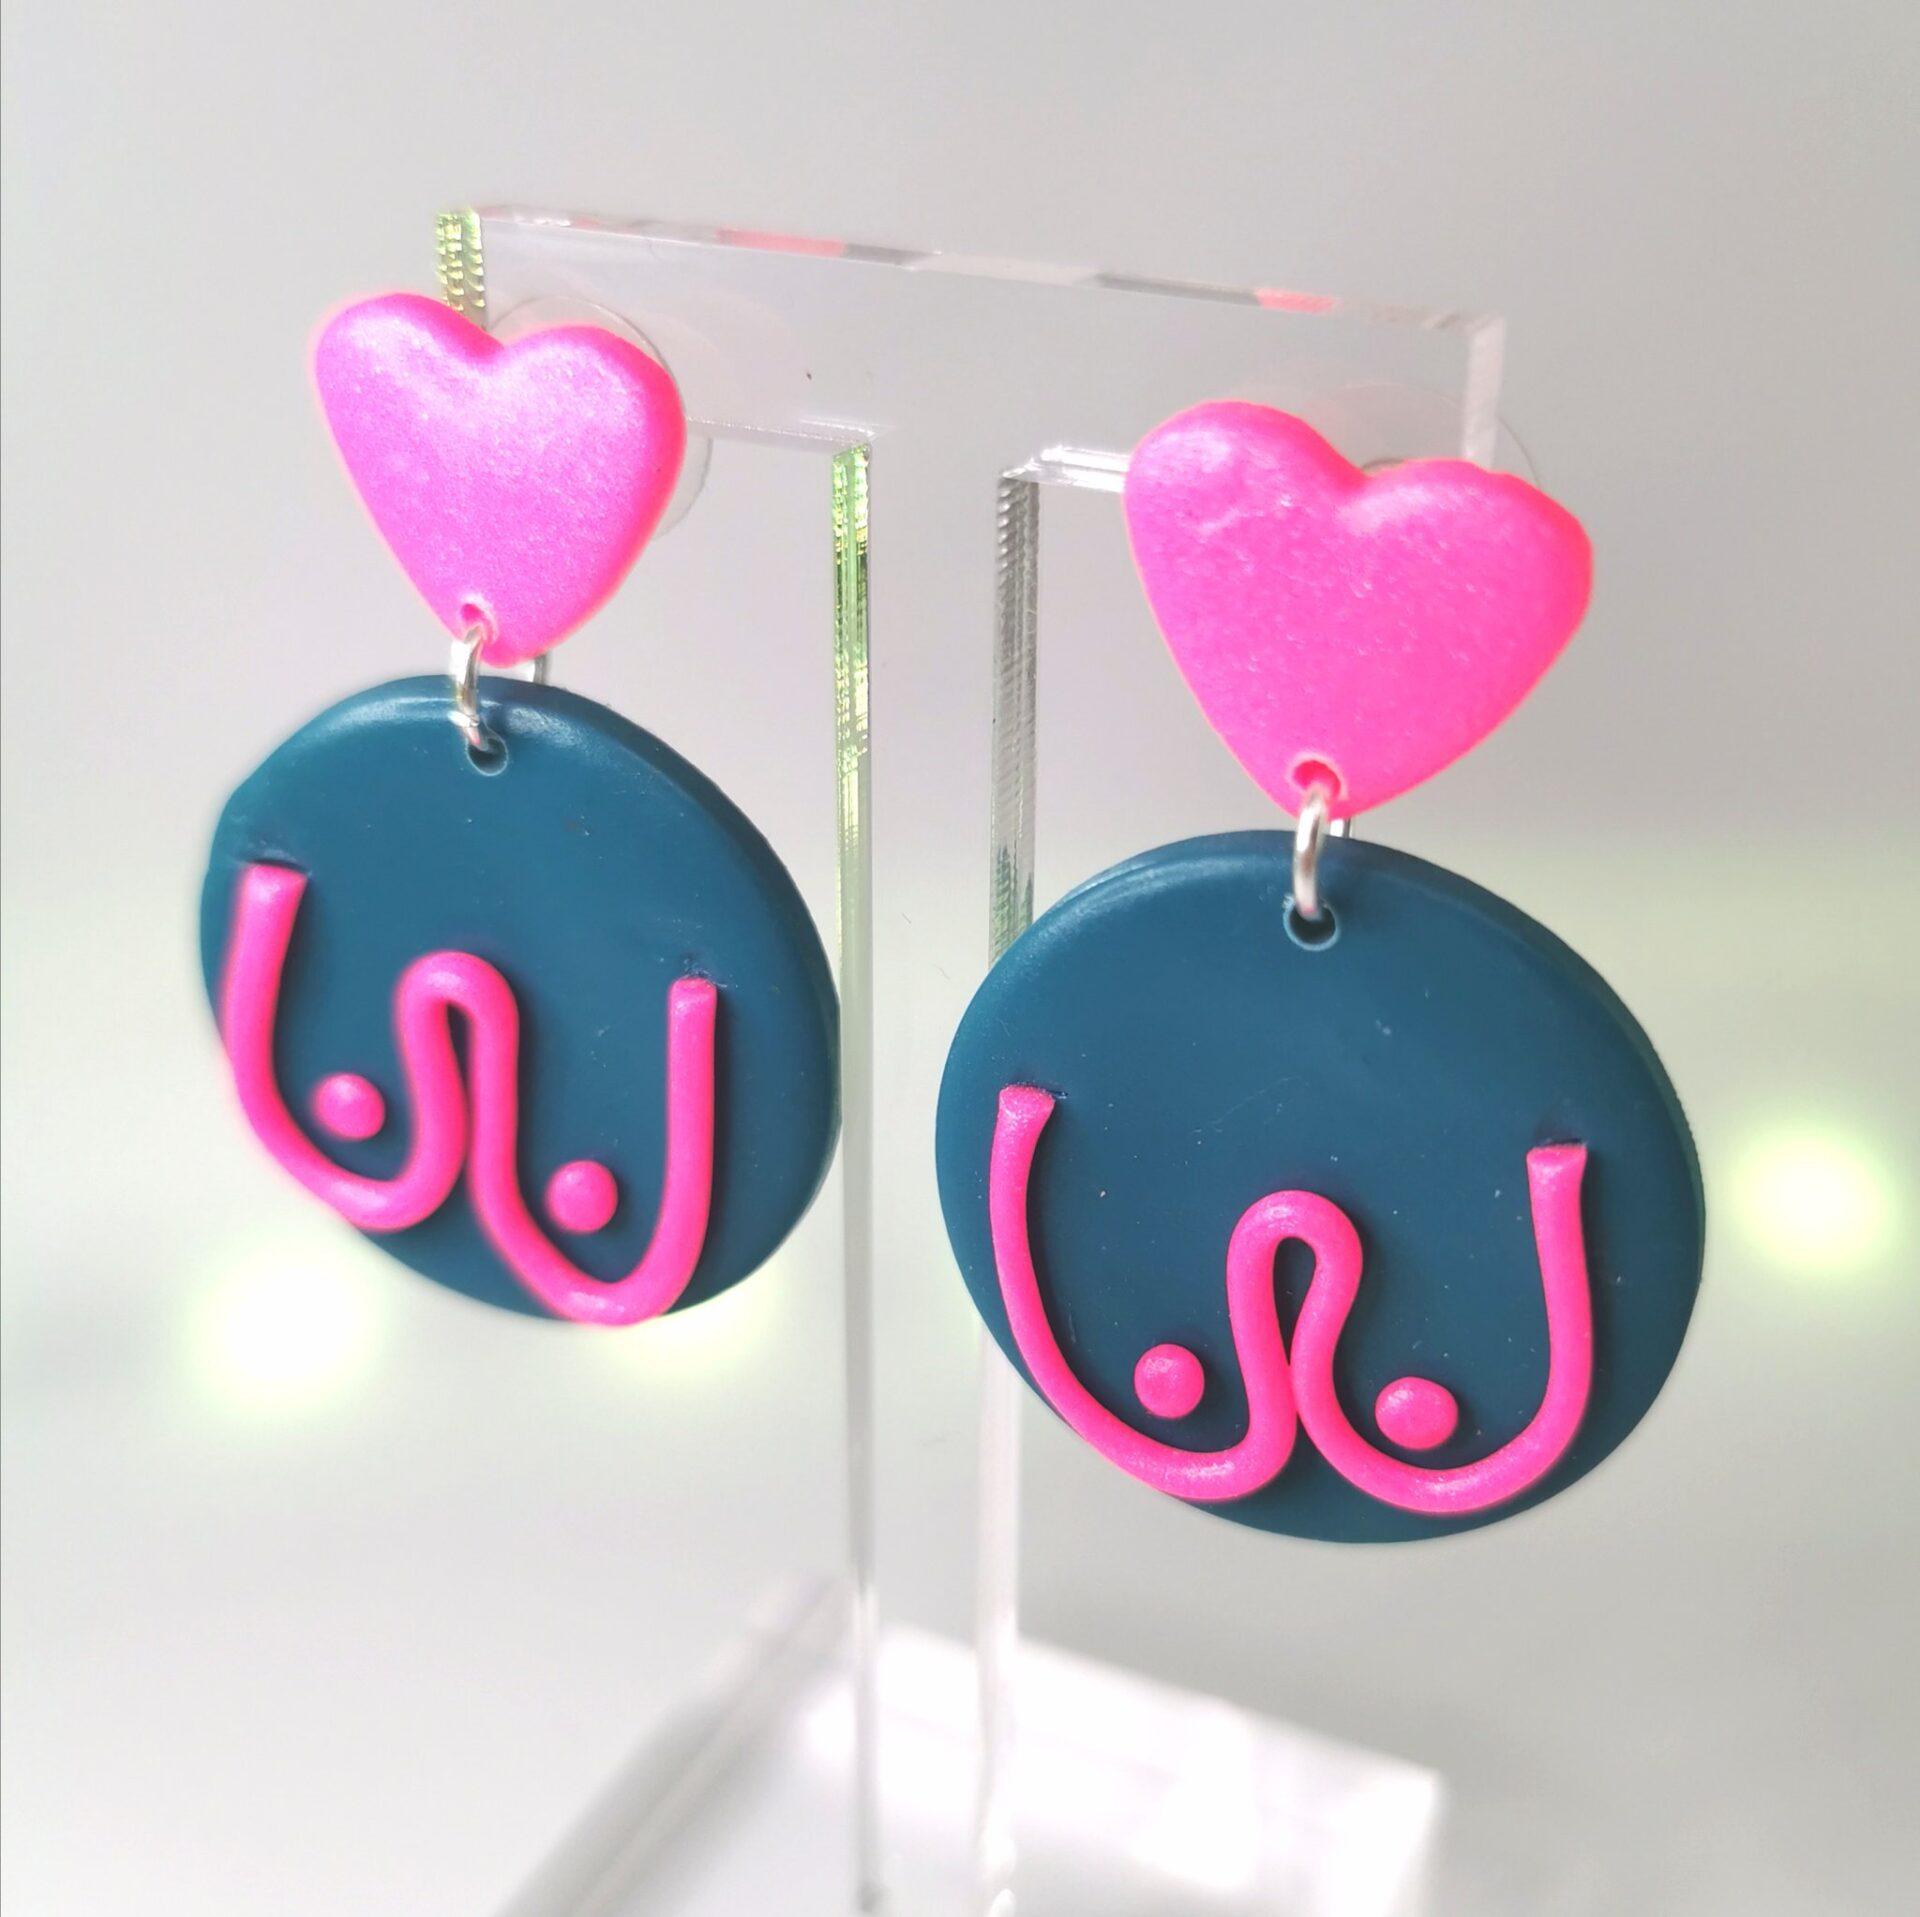 KelZo Jewellery